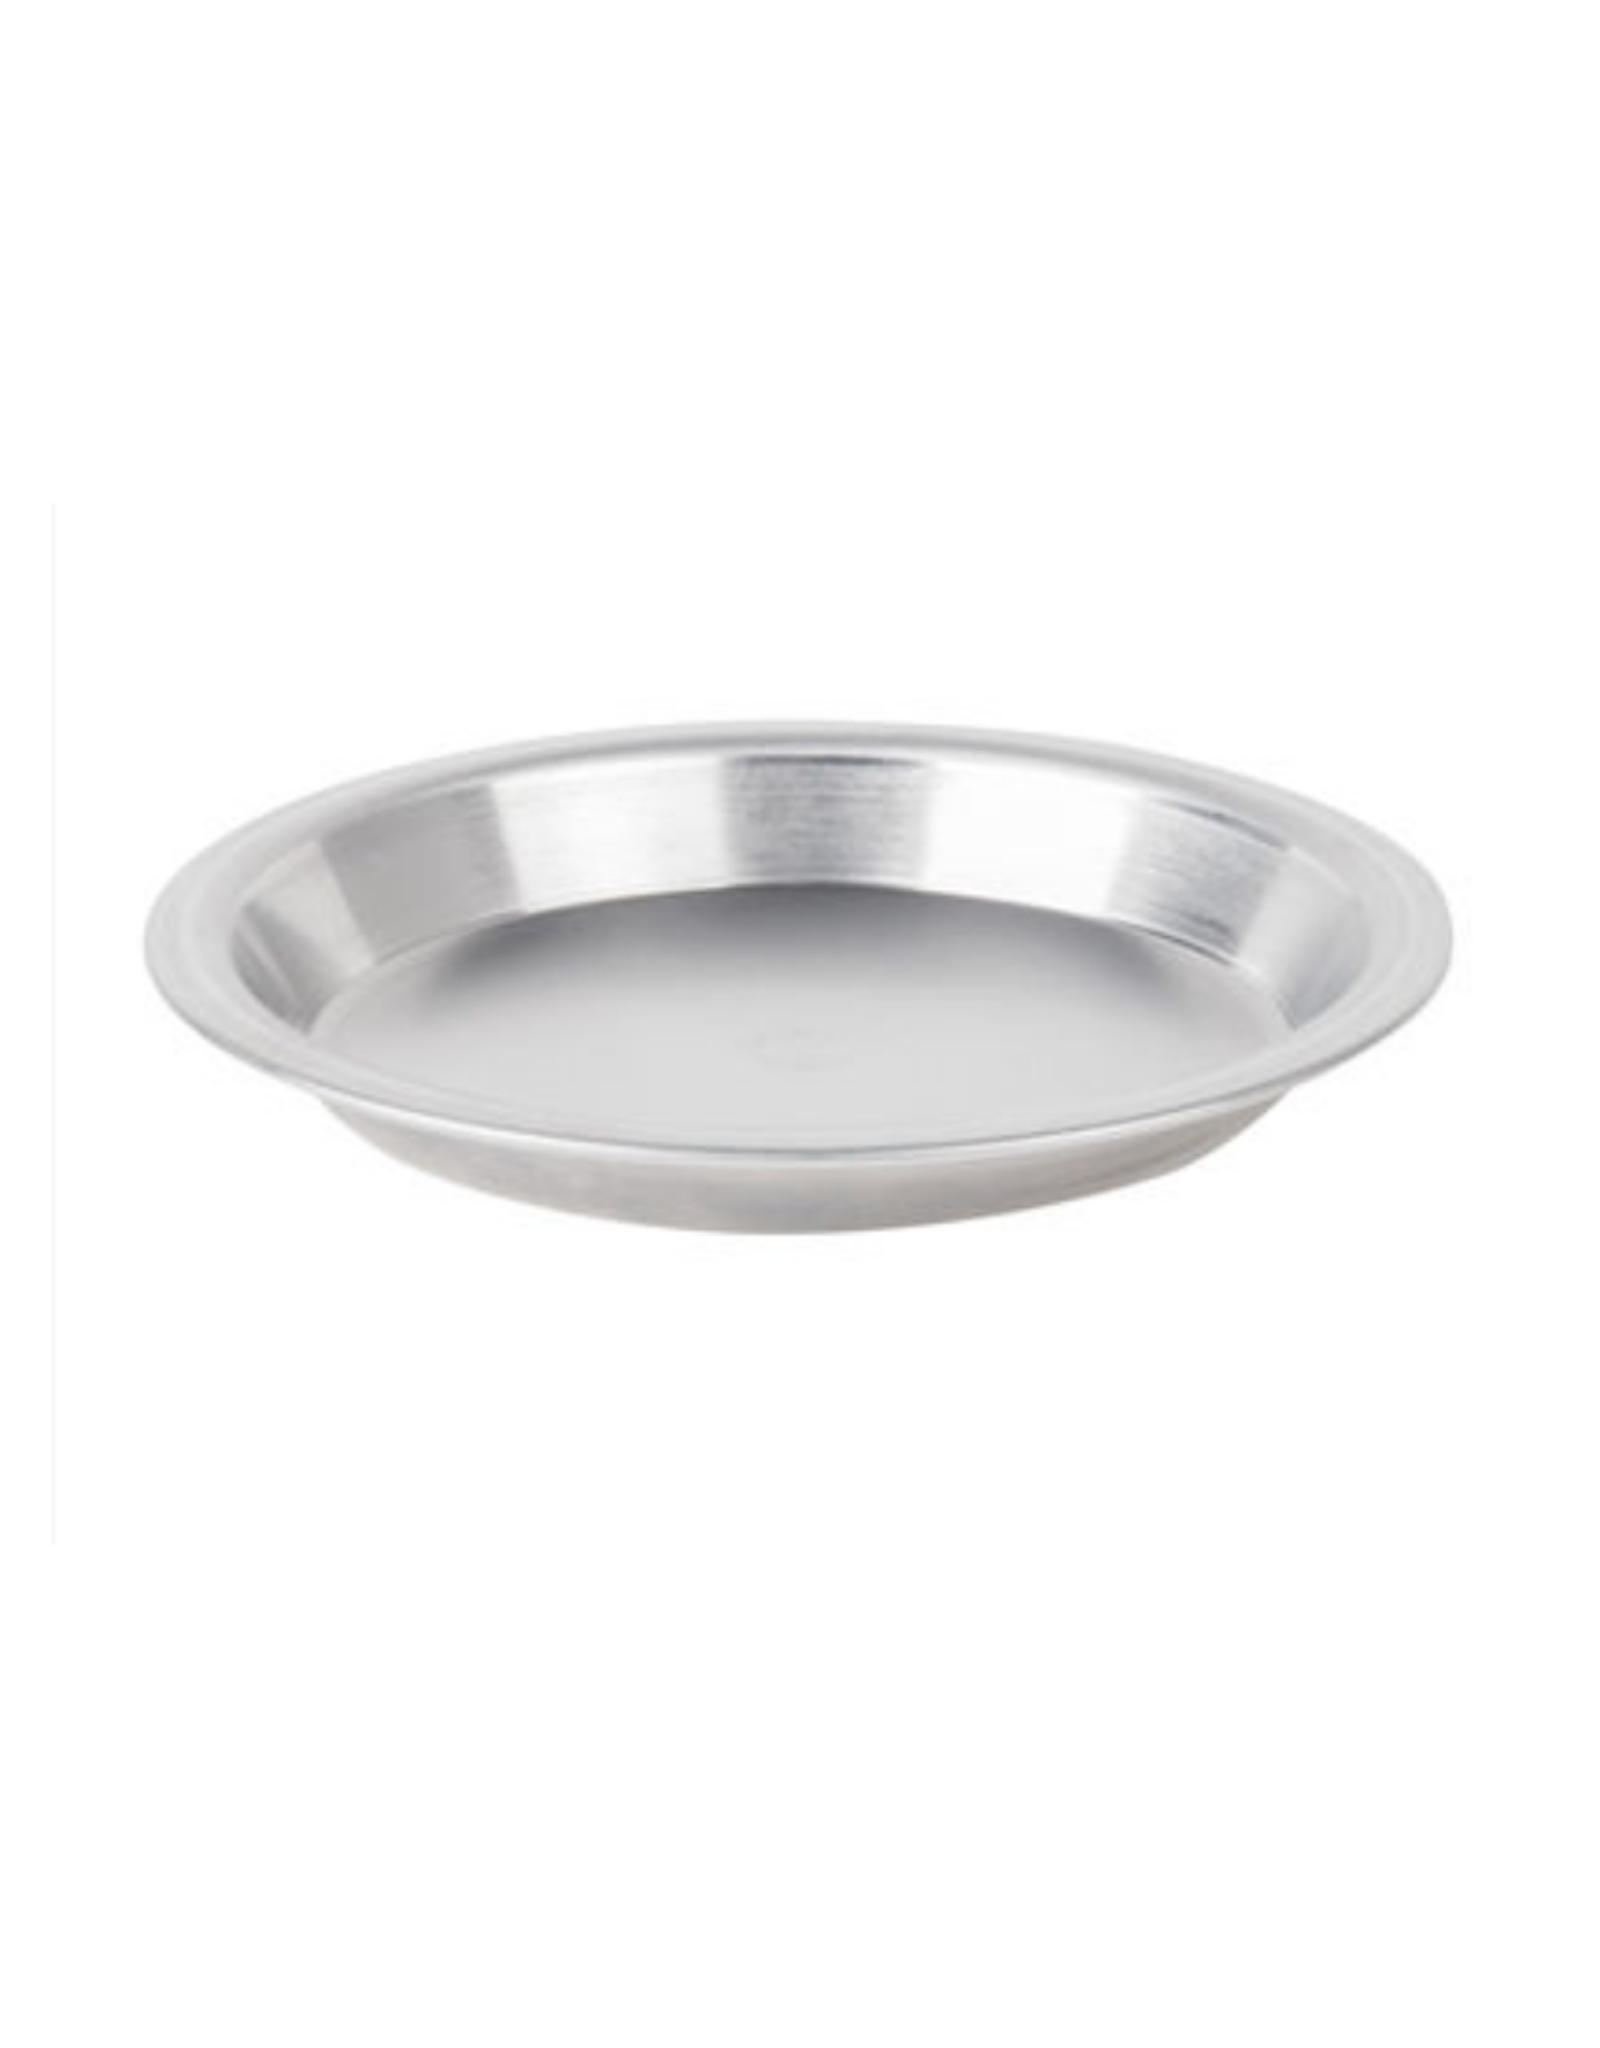 Moule à tarte en aluminium